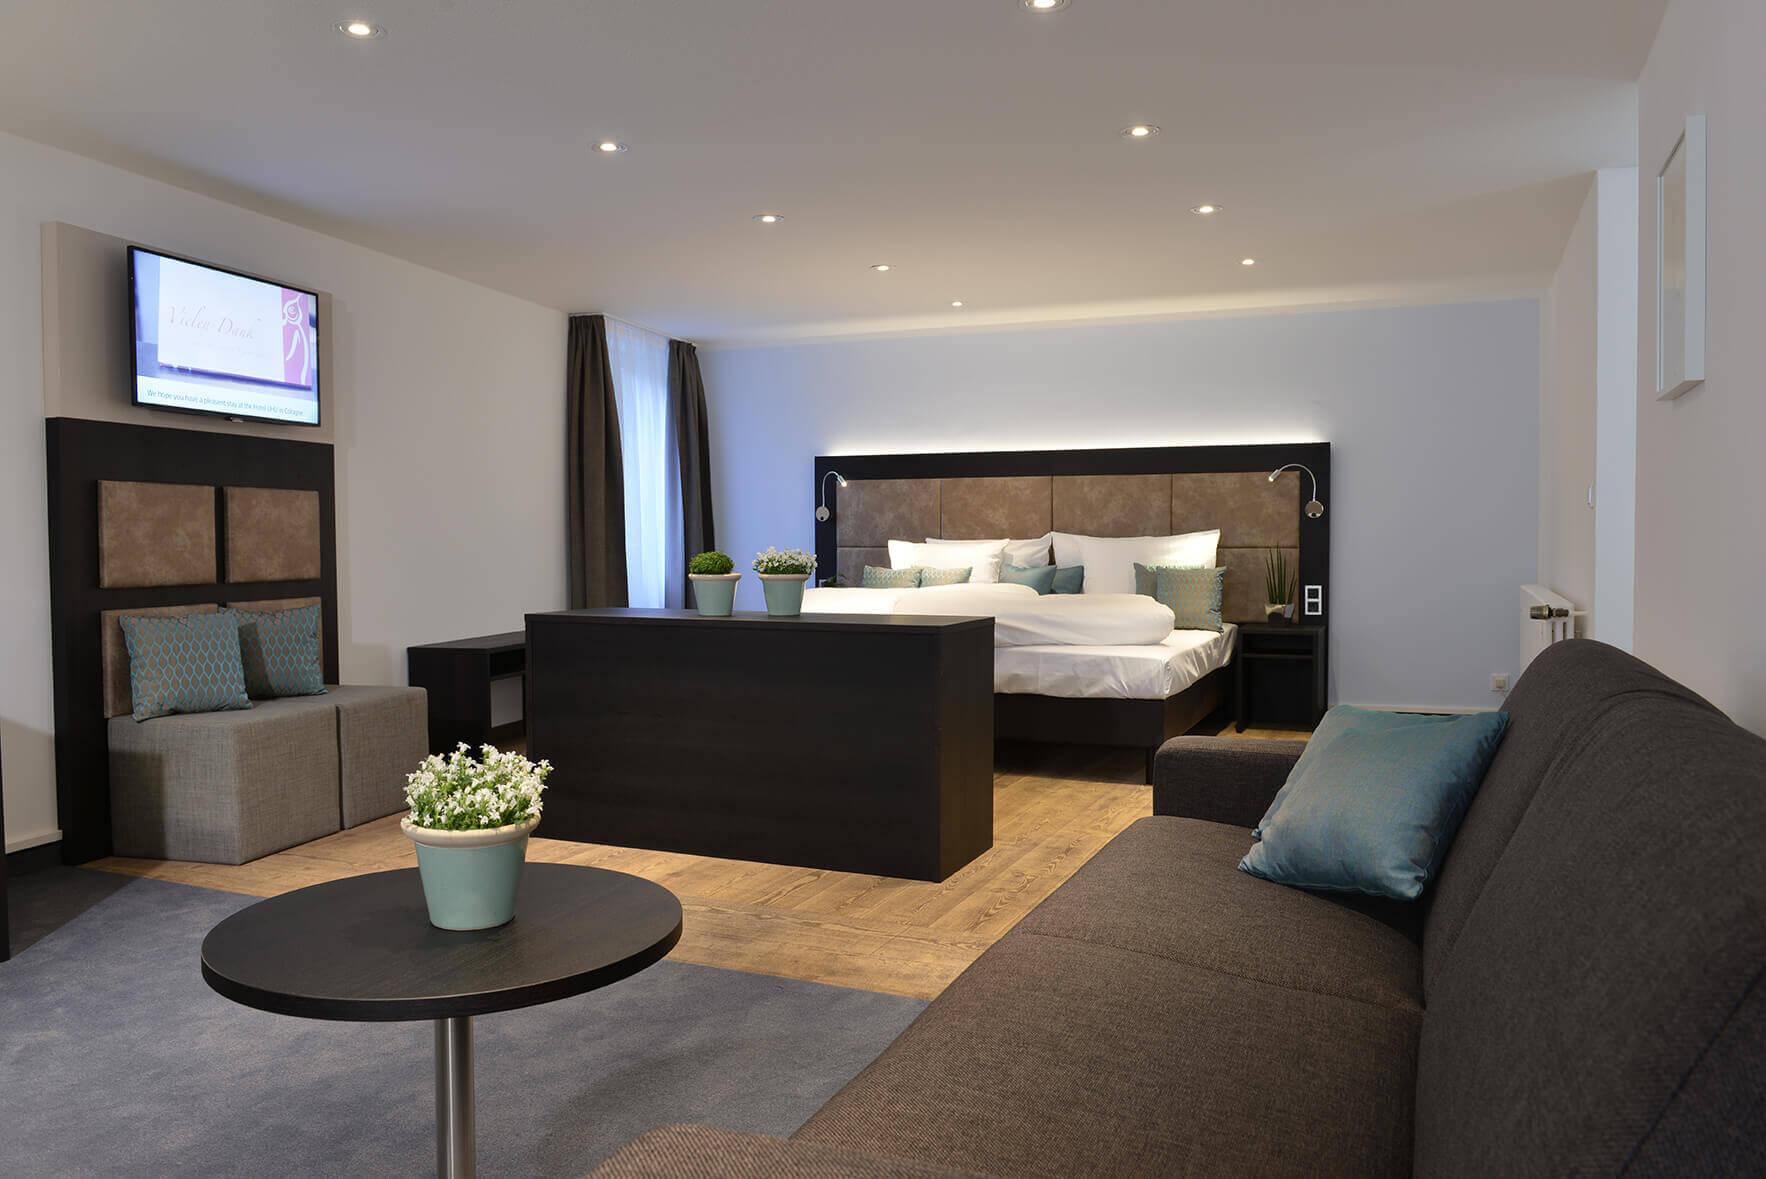 Gästehaus Hotel UHU